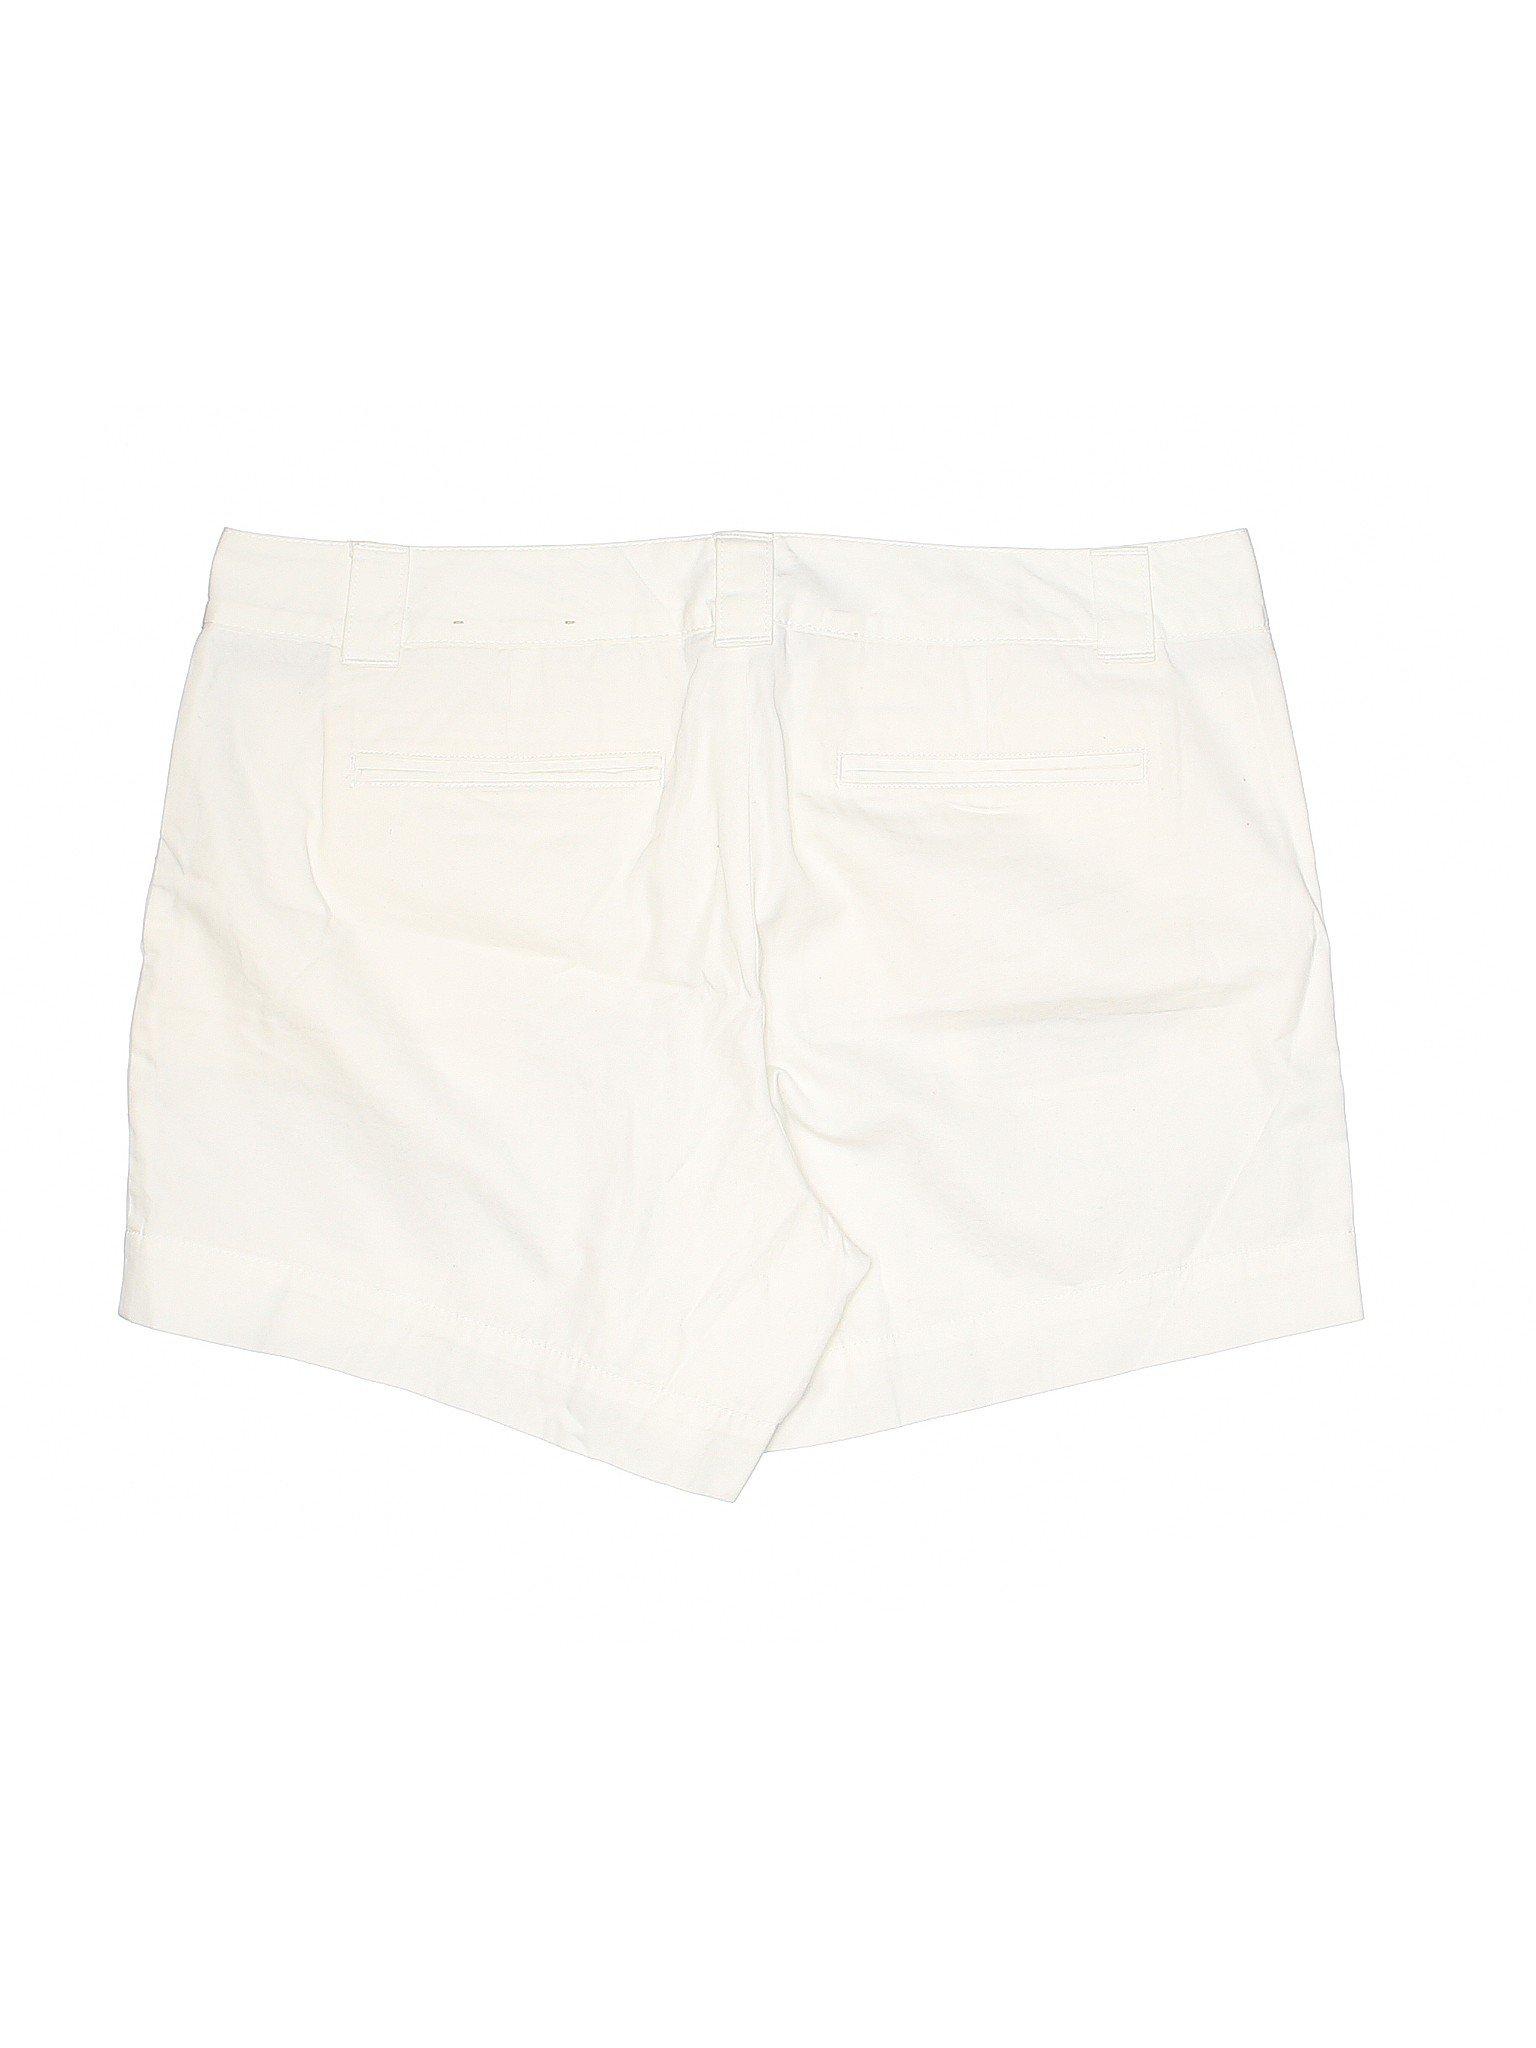 End Khaki Shorts Lands' winter Leisure 8px1E7nwS